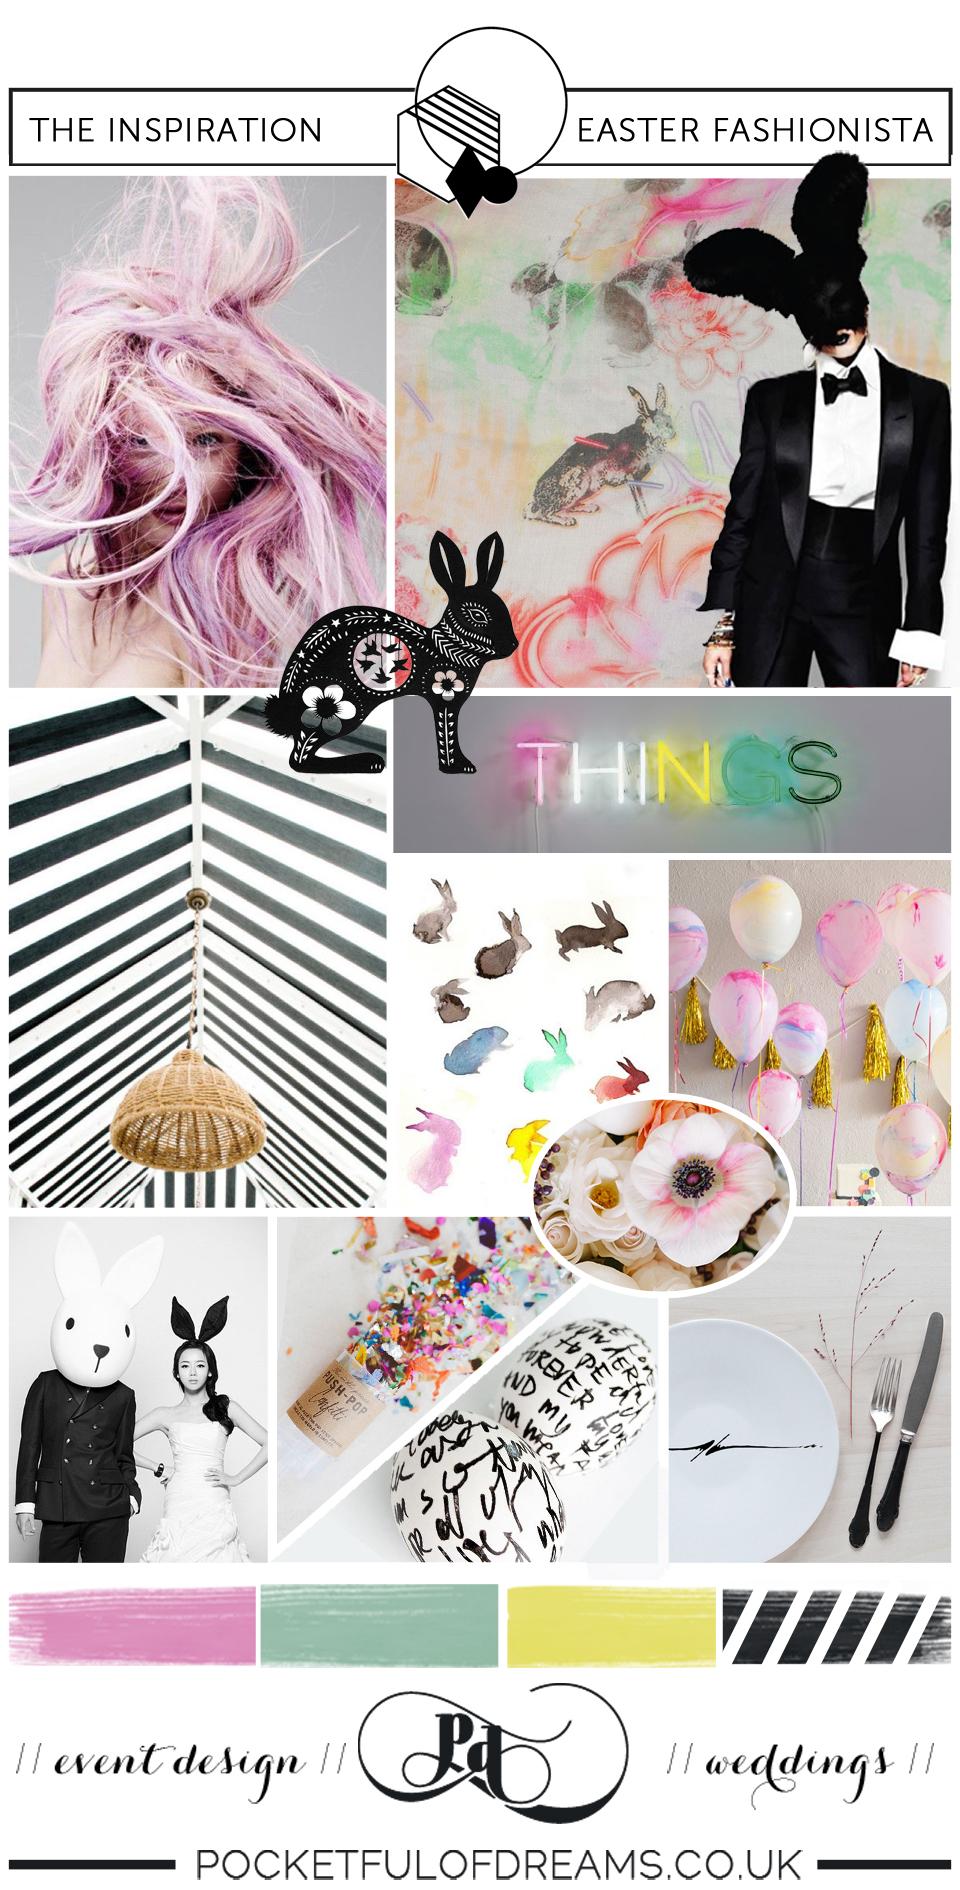 Bridal Inspiration Boards #72 ~ Easter Fashionista